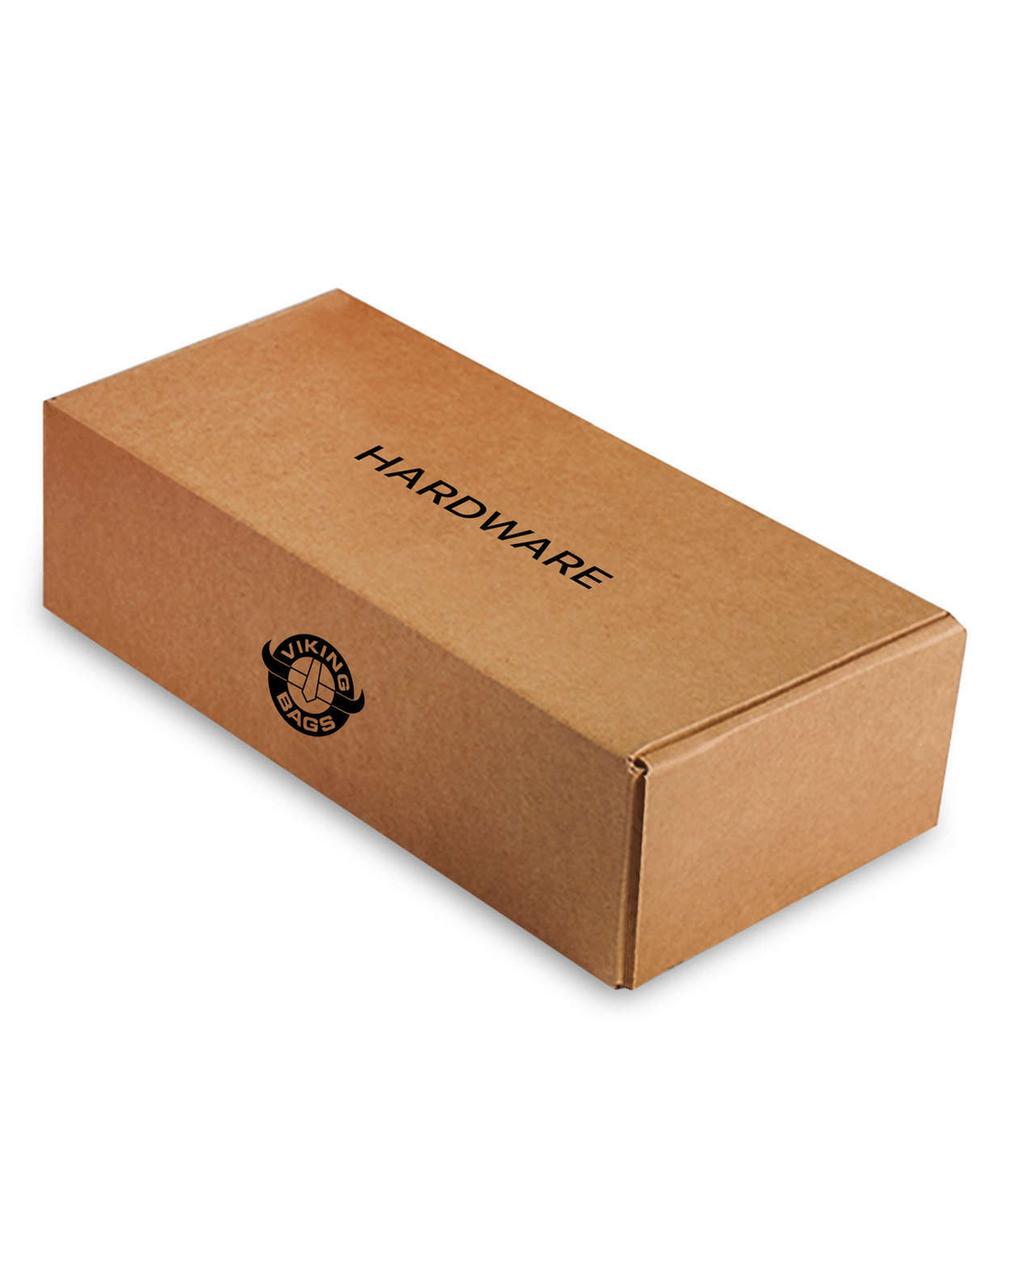 Triumph Rocket III Roadster Slanted Medium Motorcycle Saddlebags Box